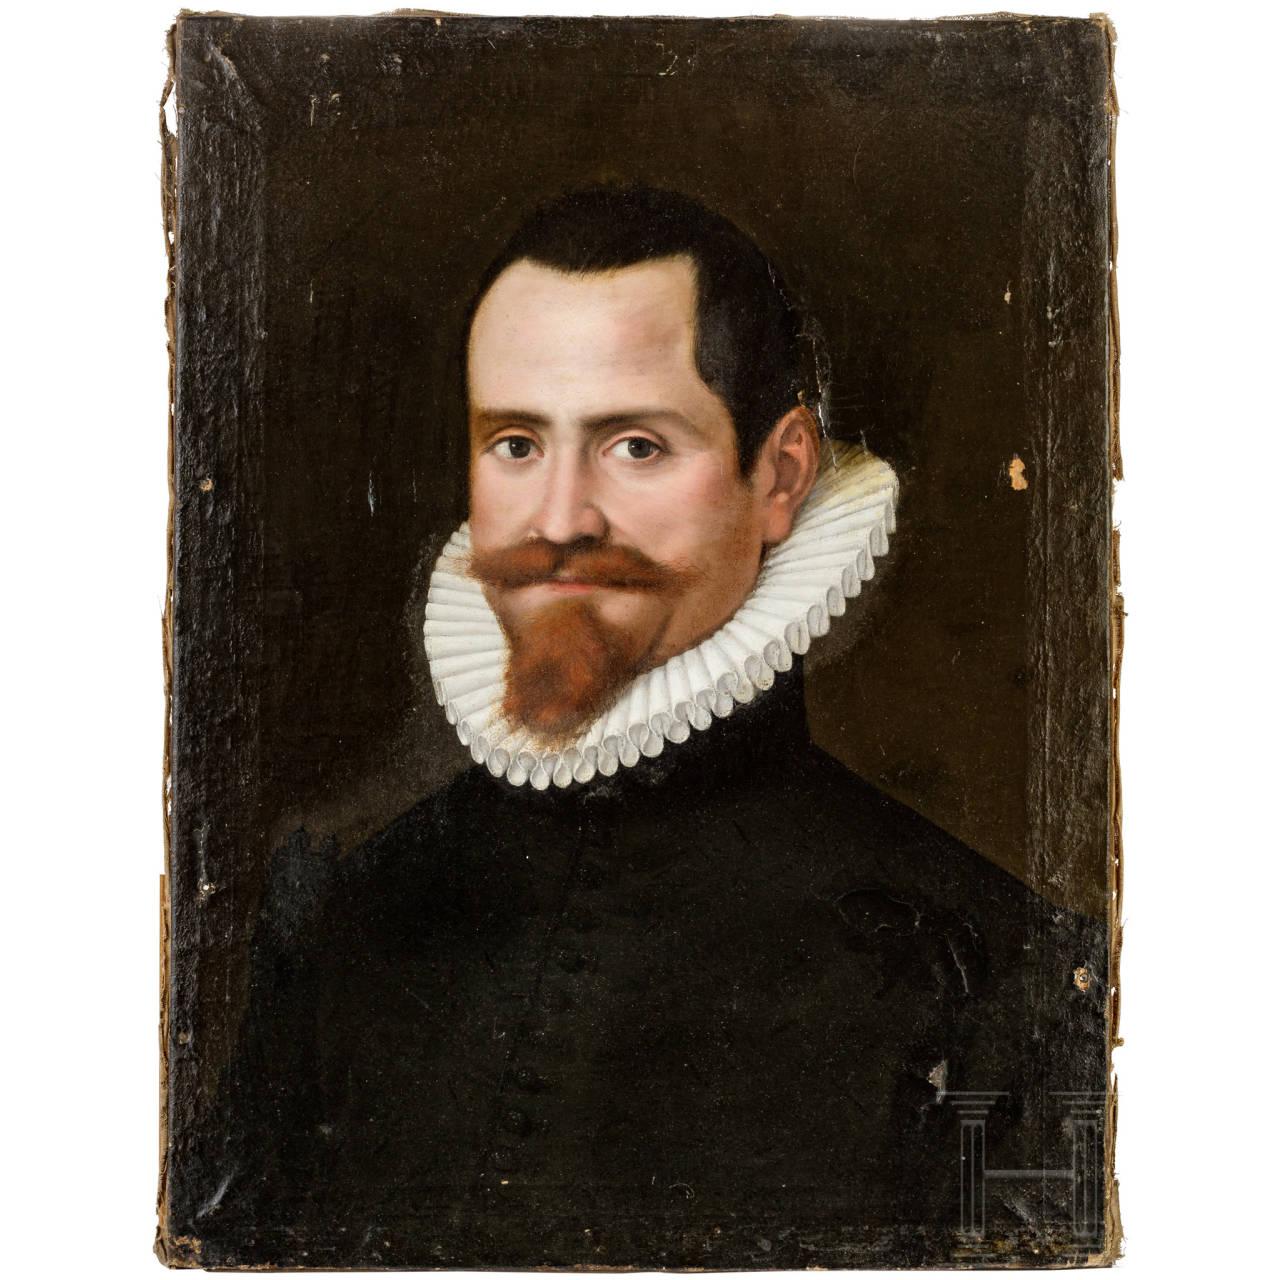 Portrait of Domenico Lucatello, Italy, dated 1588